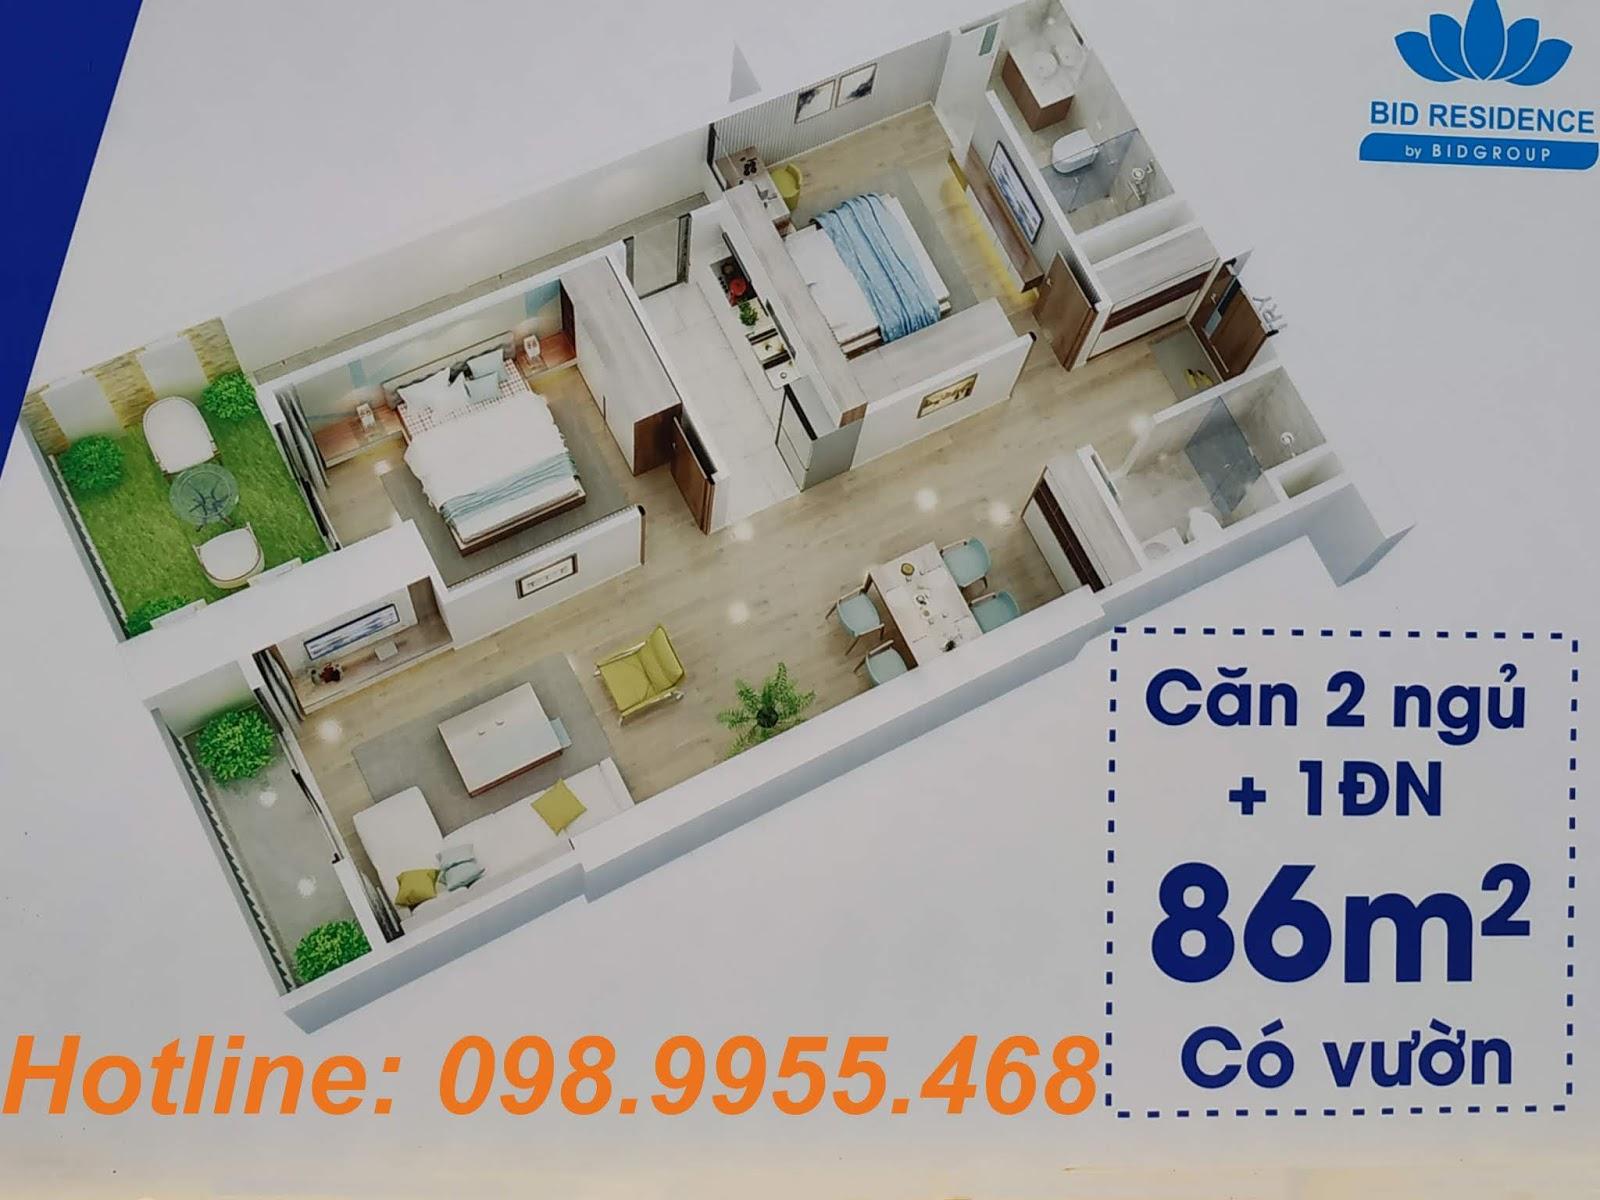 can-ho-86m2-bid-residence